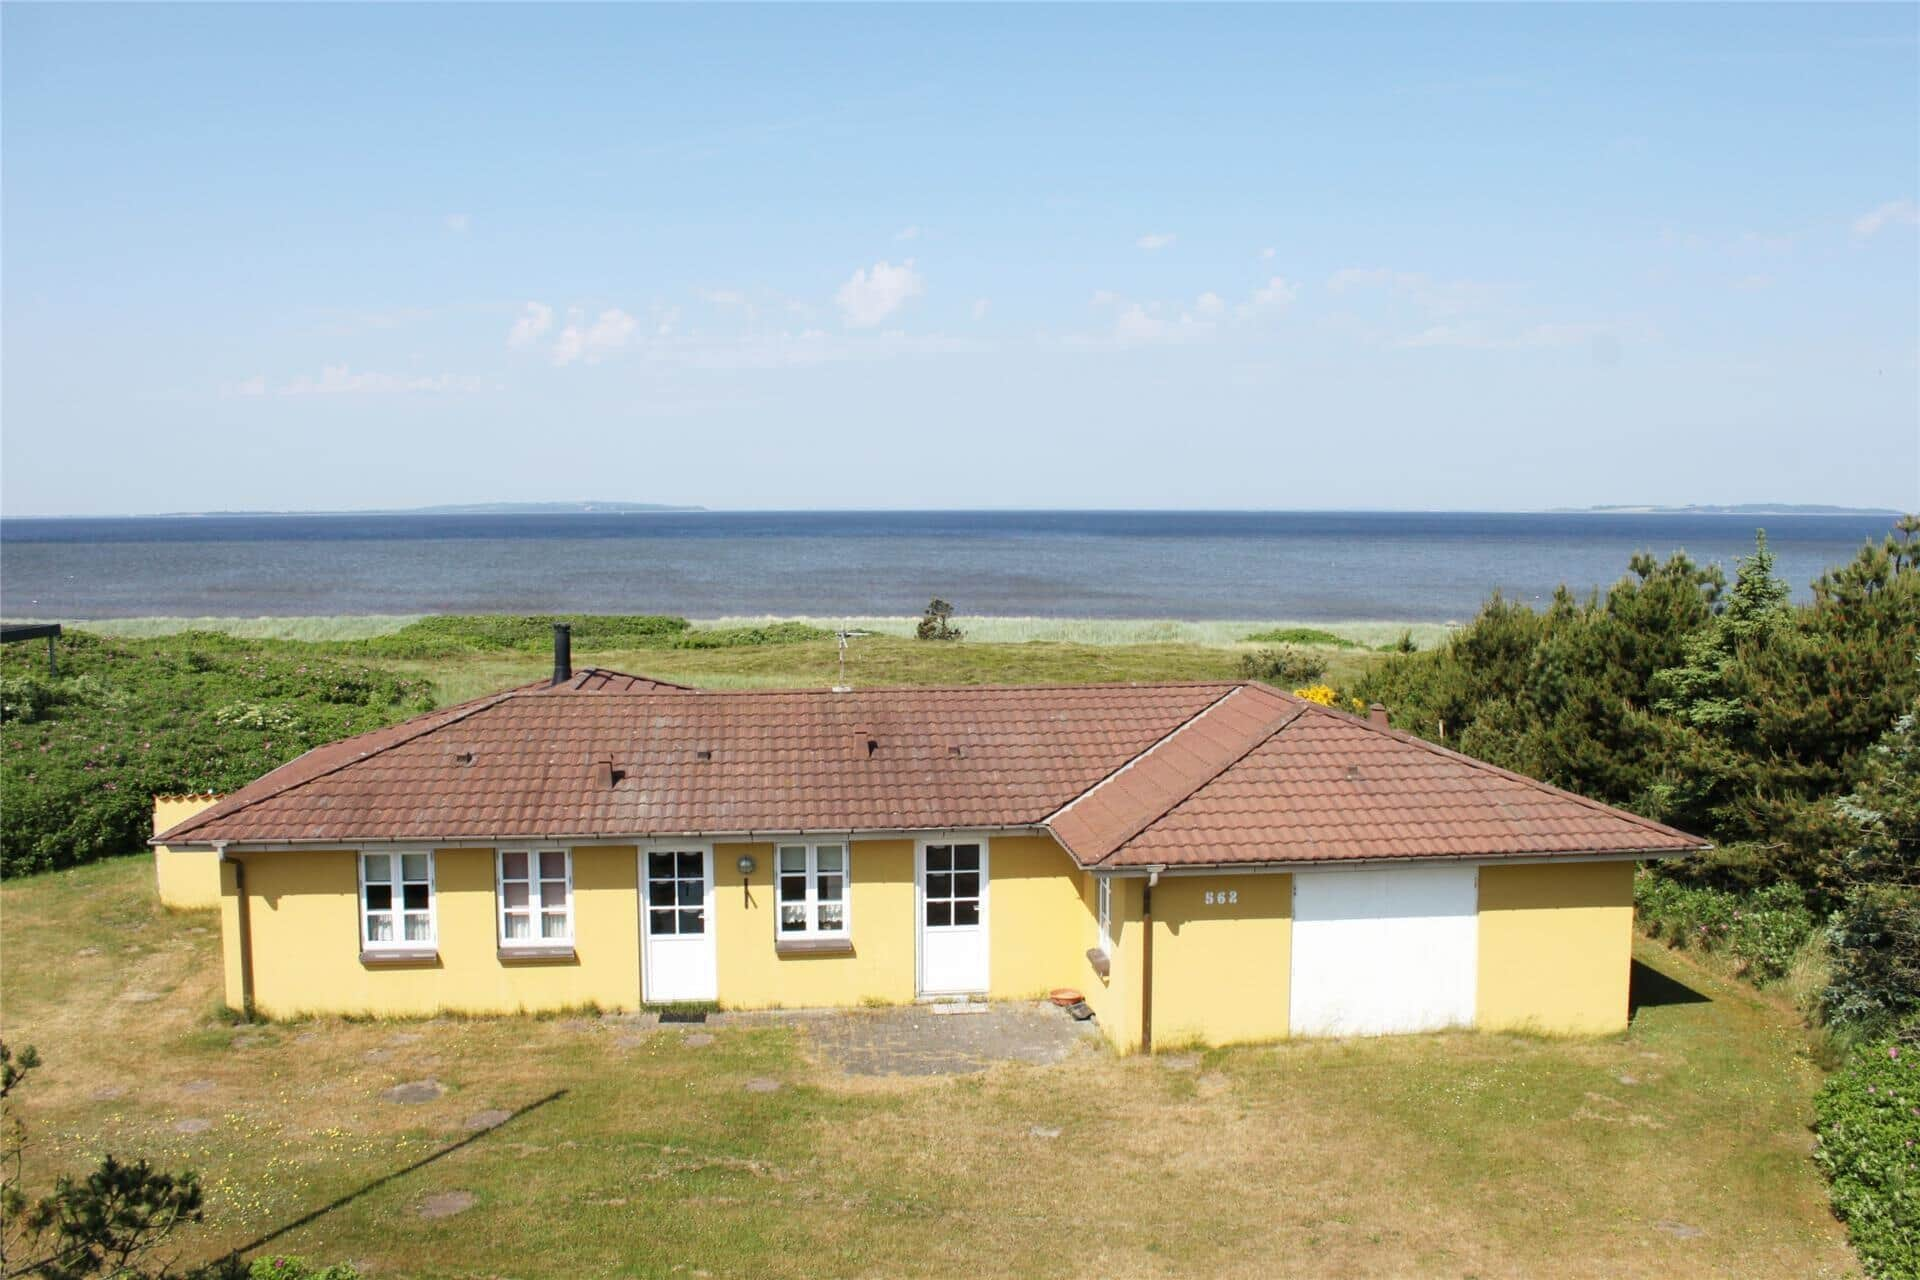 Billede 1-3 Sommerhus L16230, Viborgvej 562, DK - 9670 Løgstør